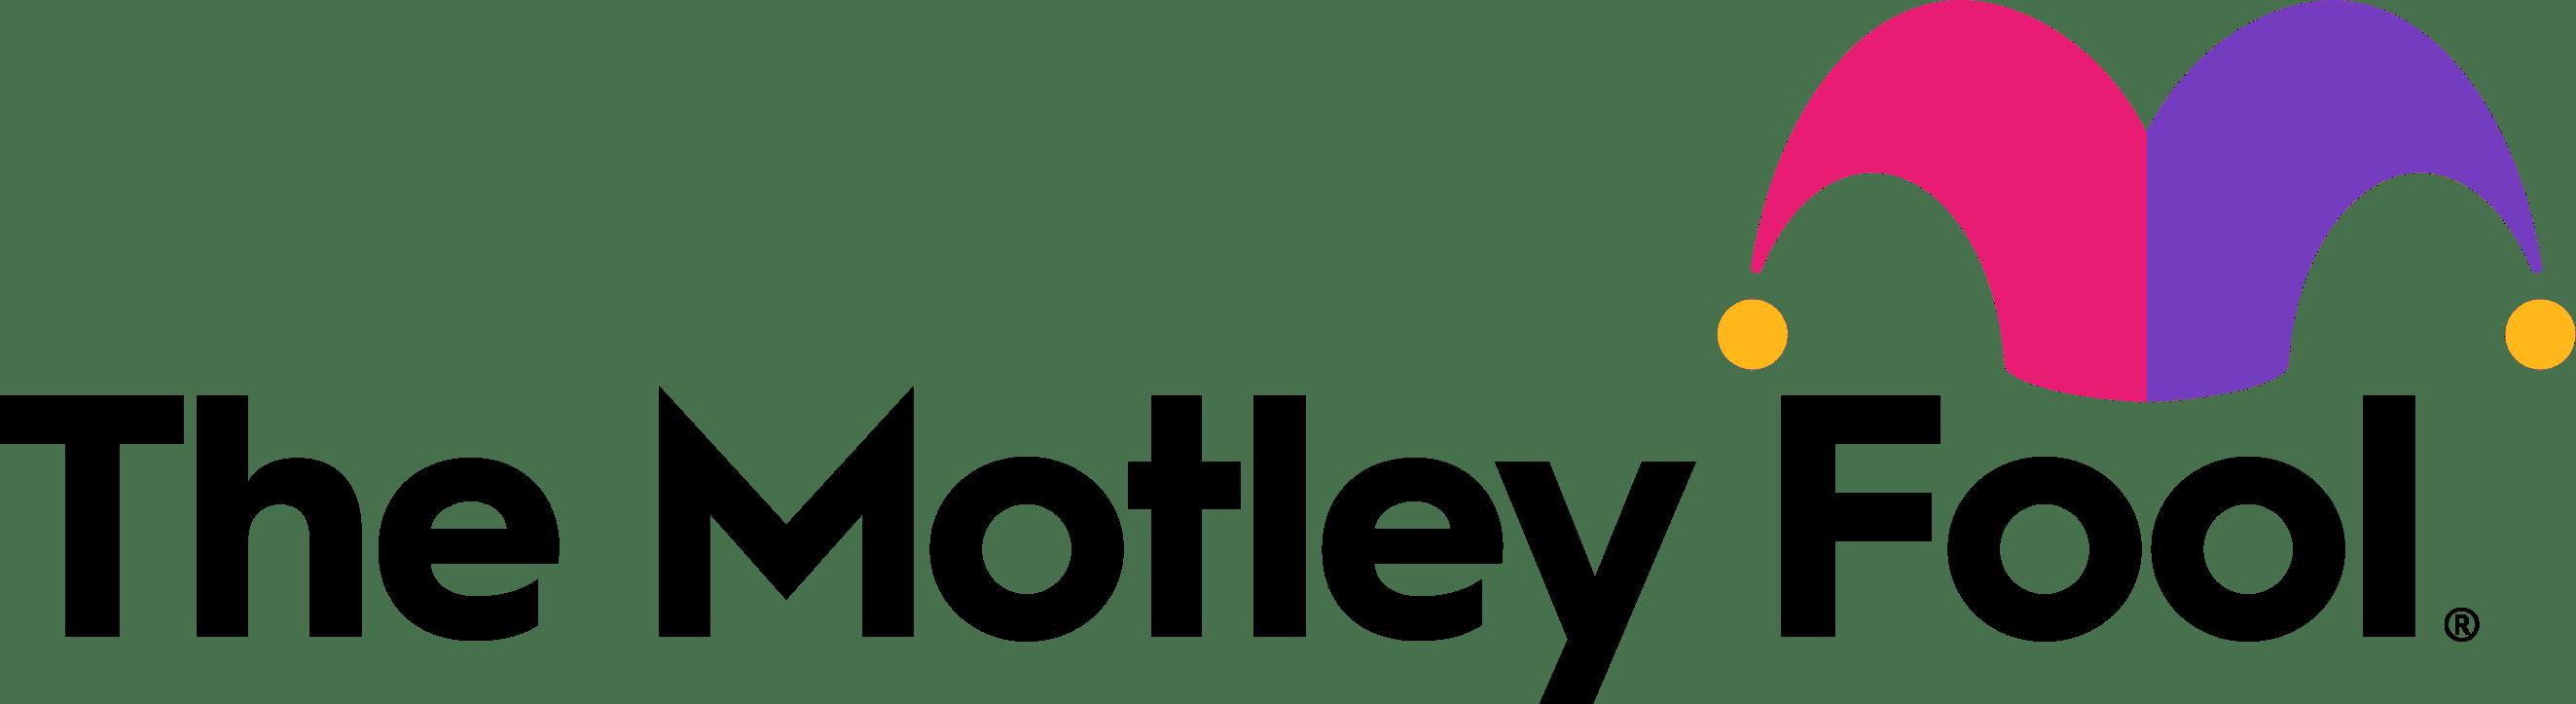 The Motley Fool Man Mansfield, TX Miller Premier Investment Planning LLC